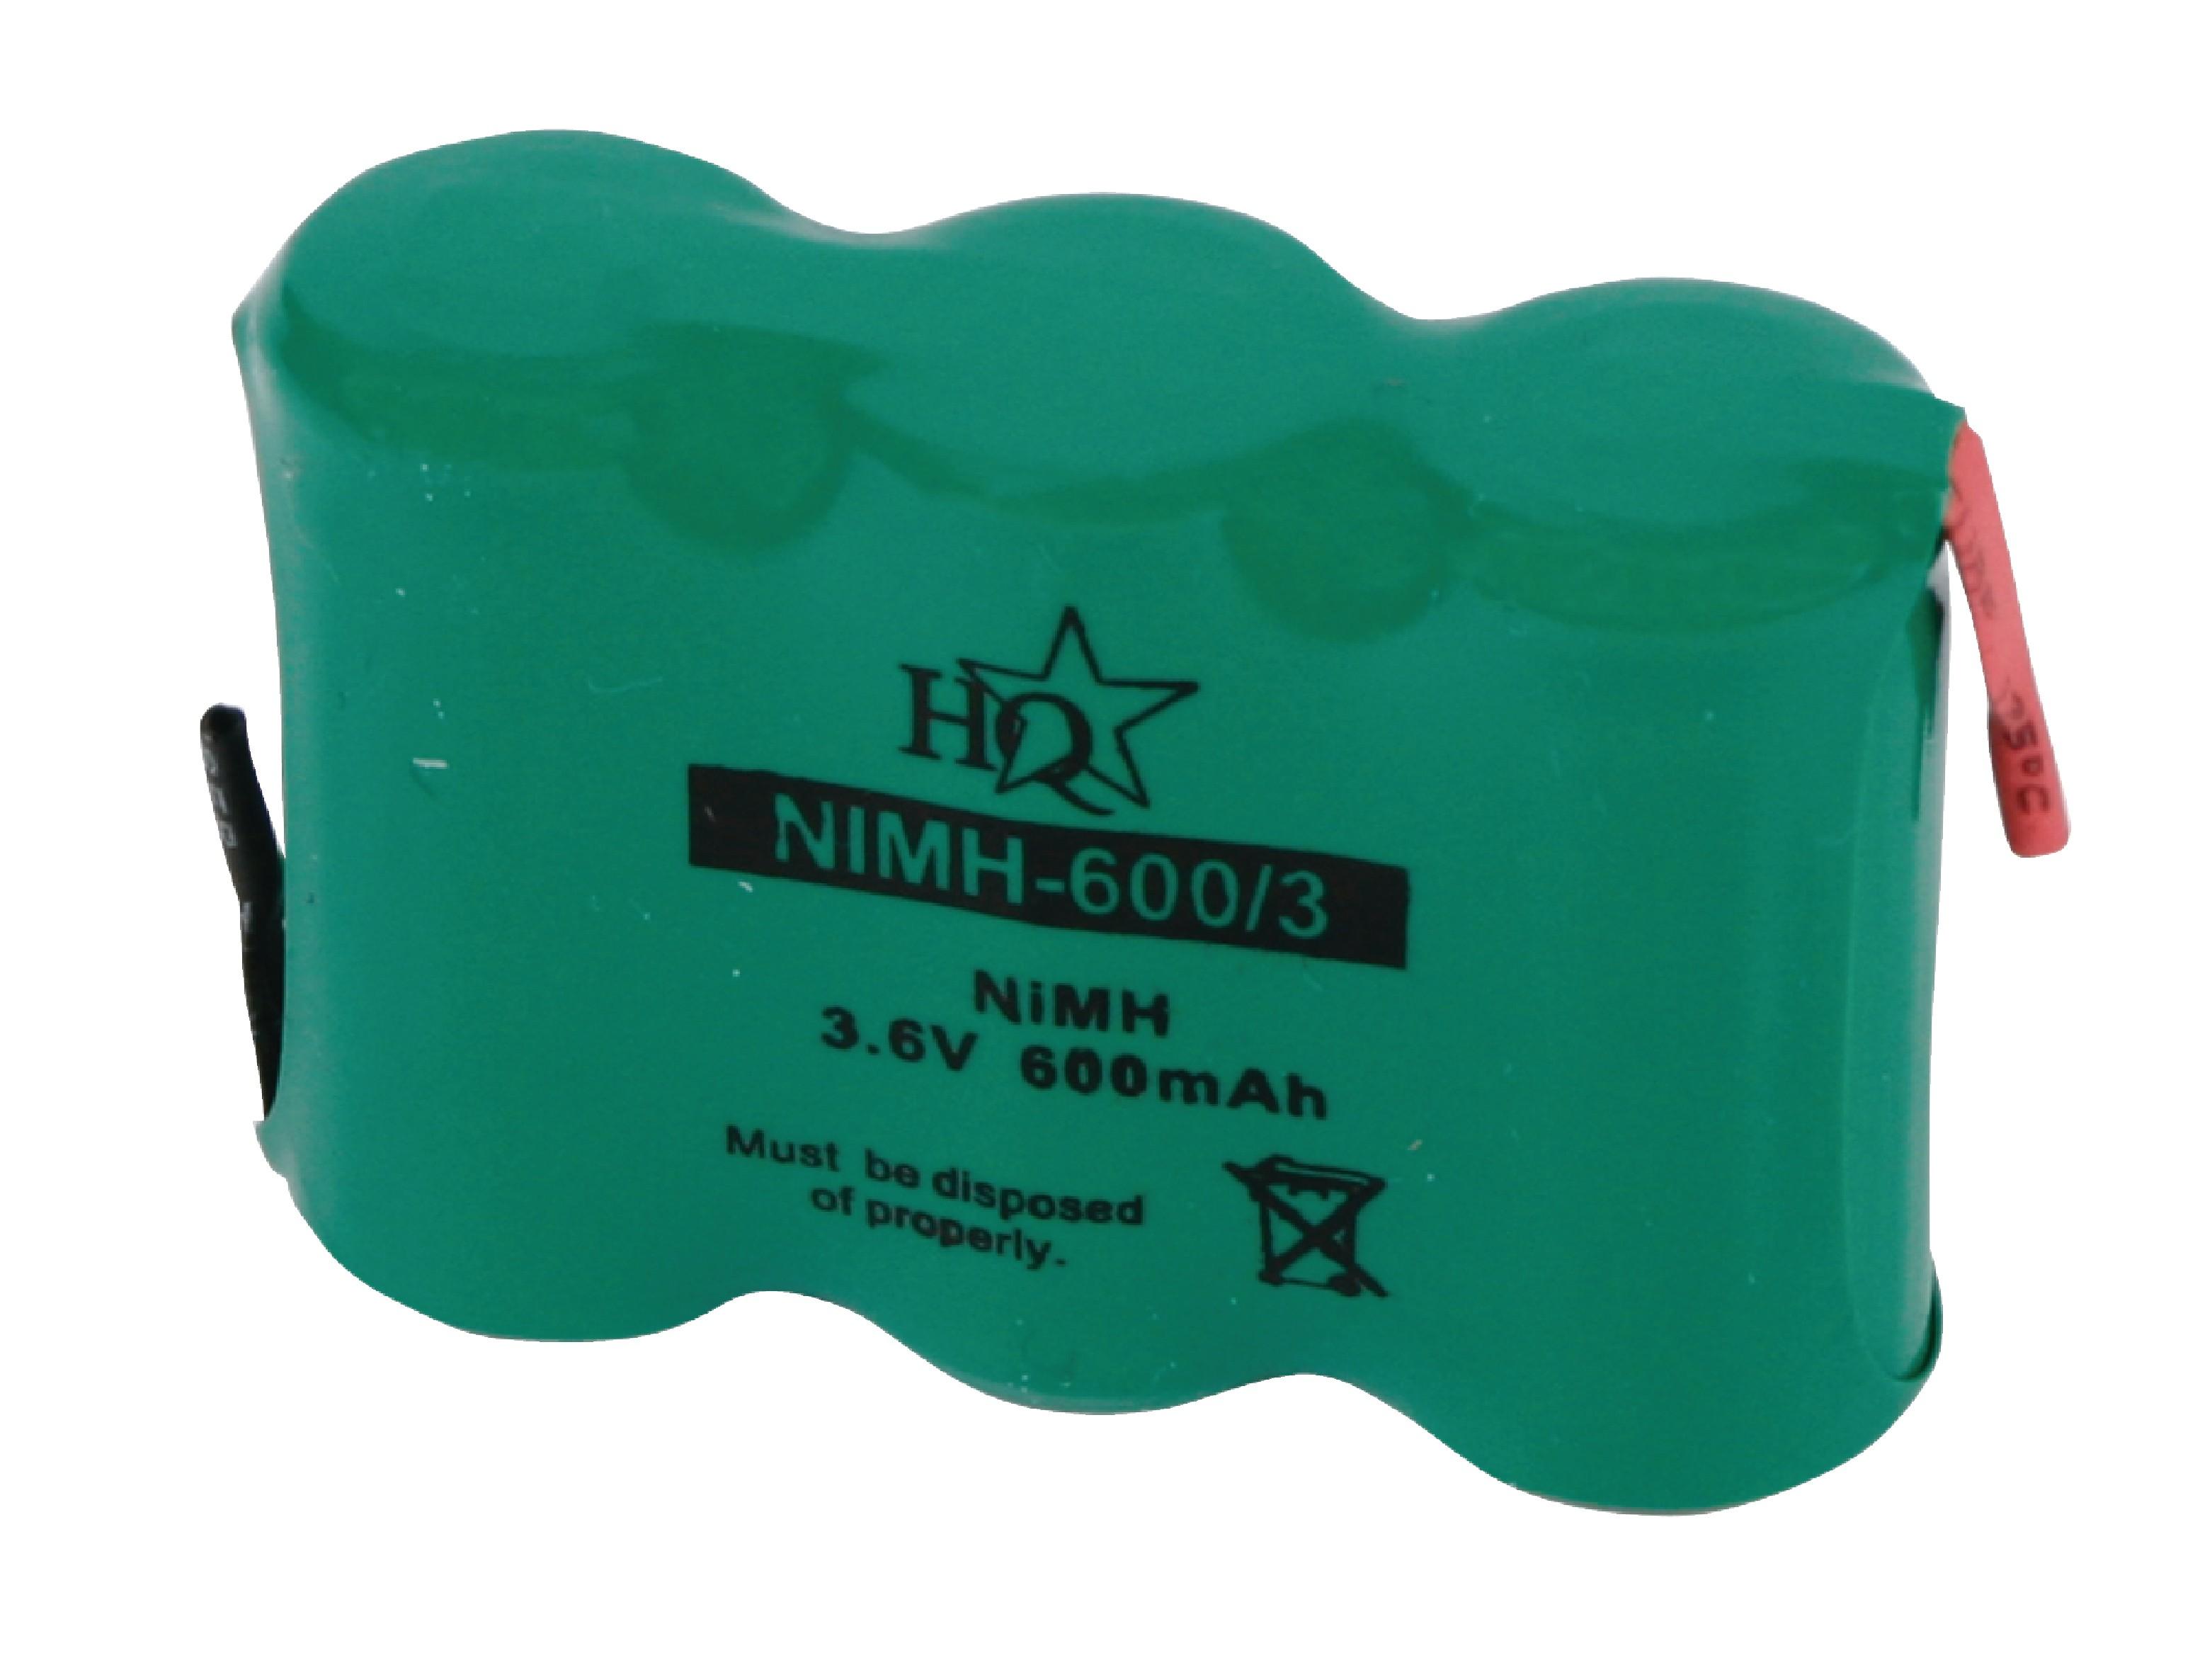 Akumulátor NiMH 3.6V/600mAh, NIMH-600/3